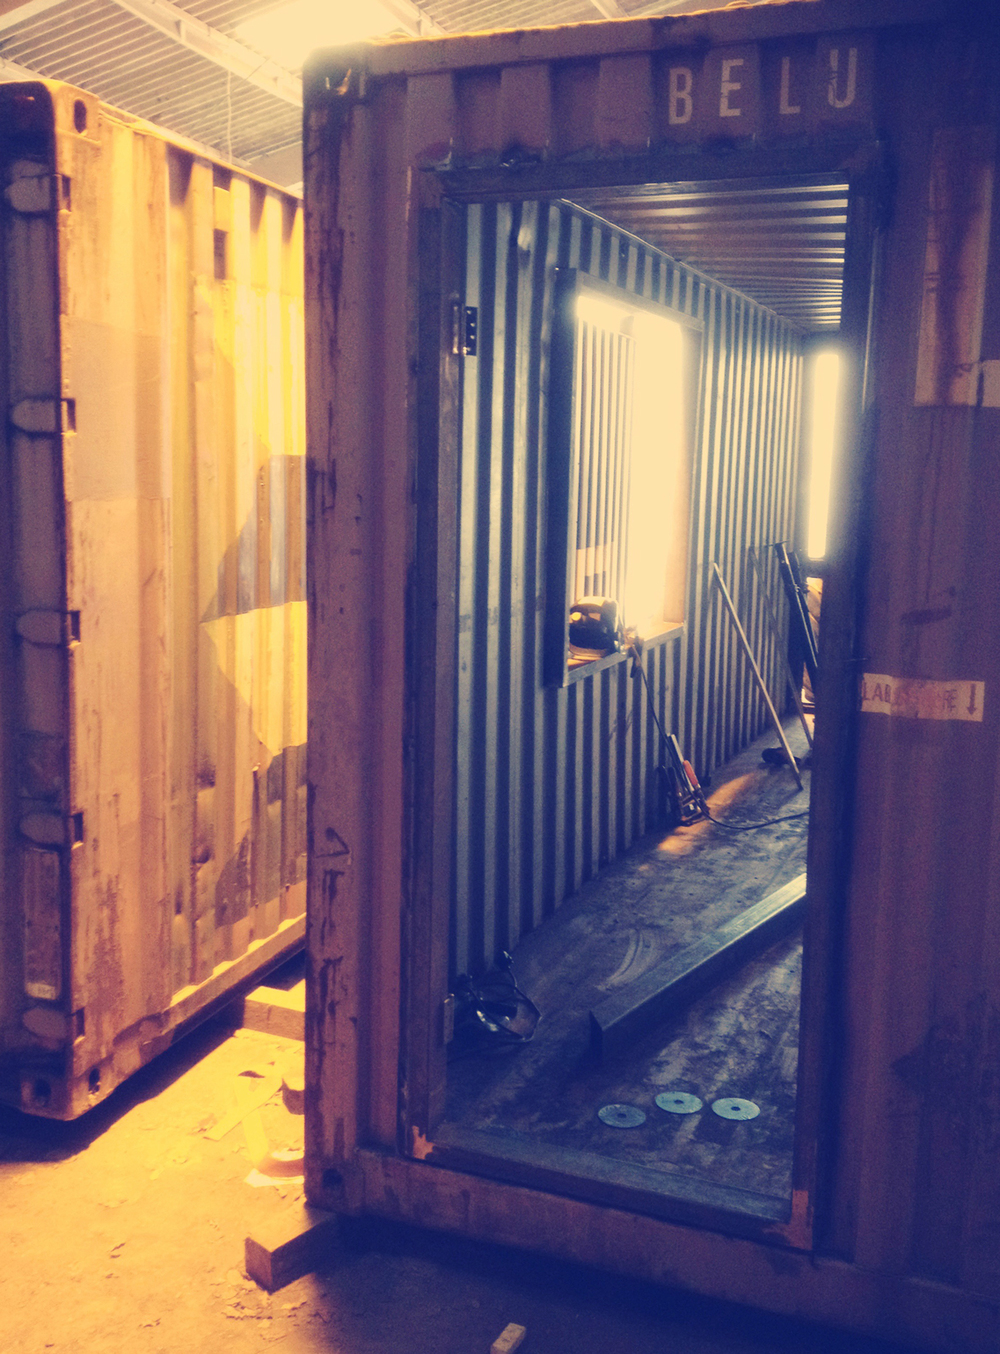 Shippingcrate1.jpg